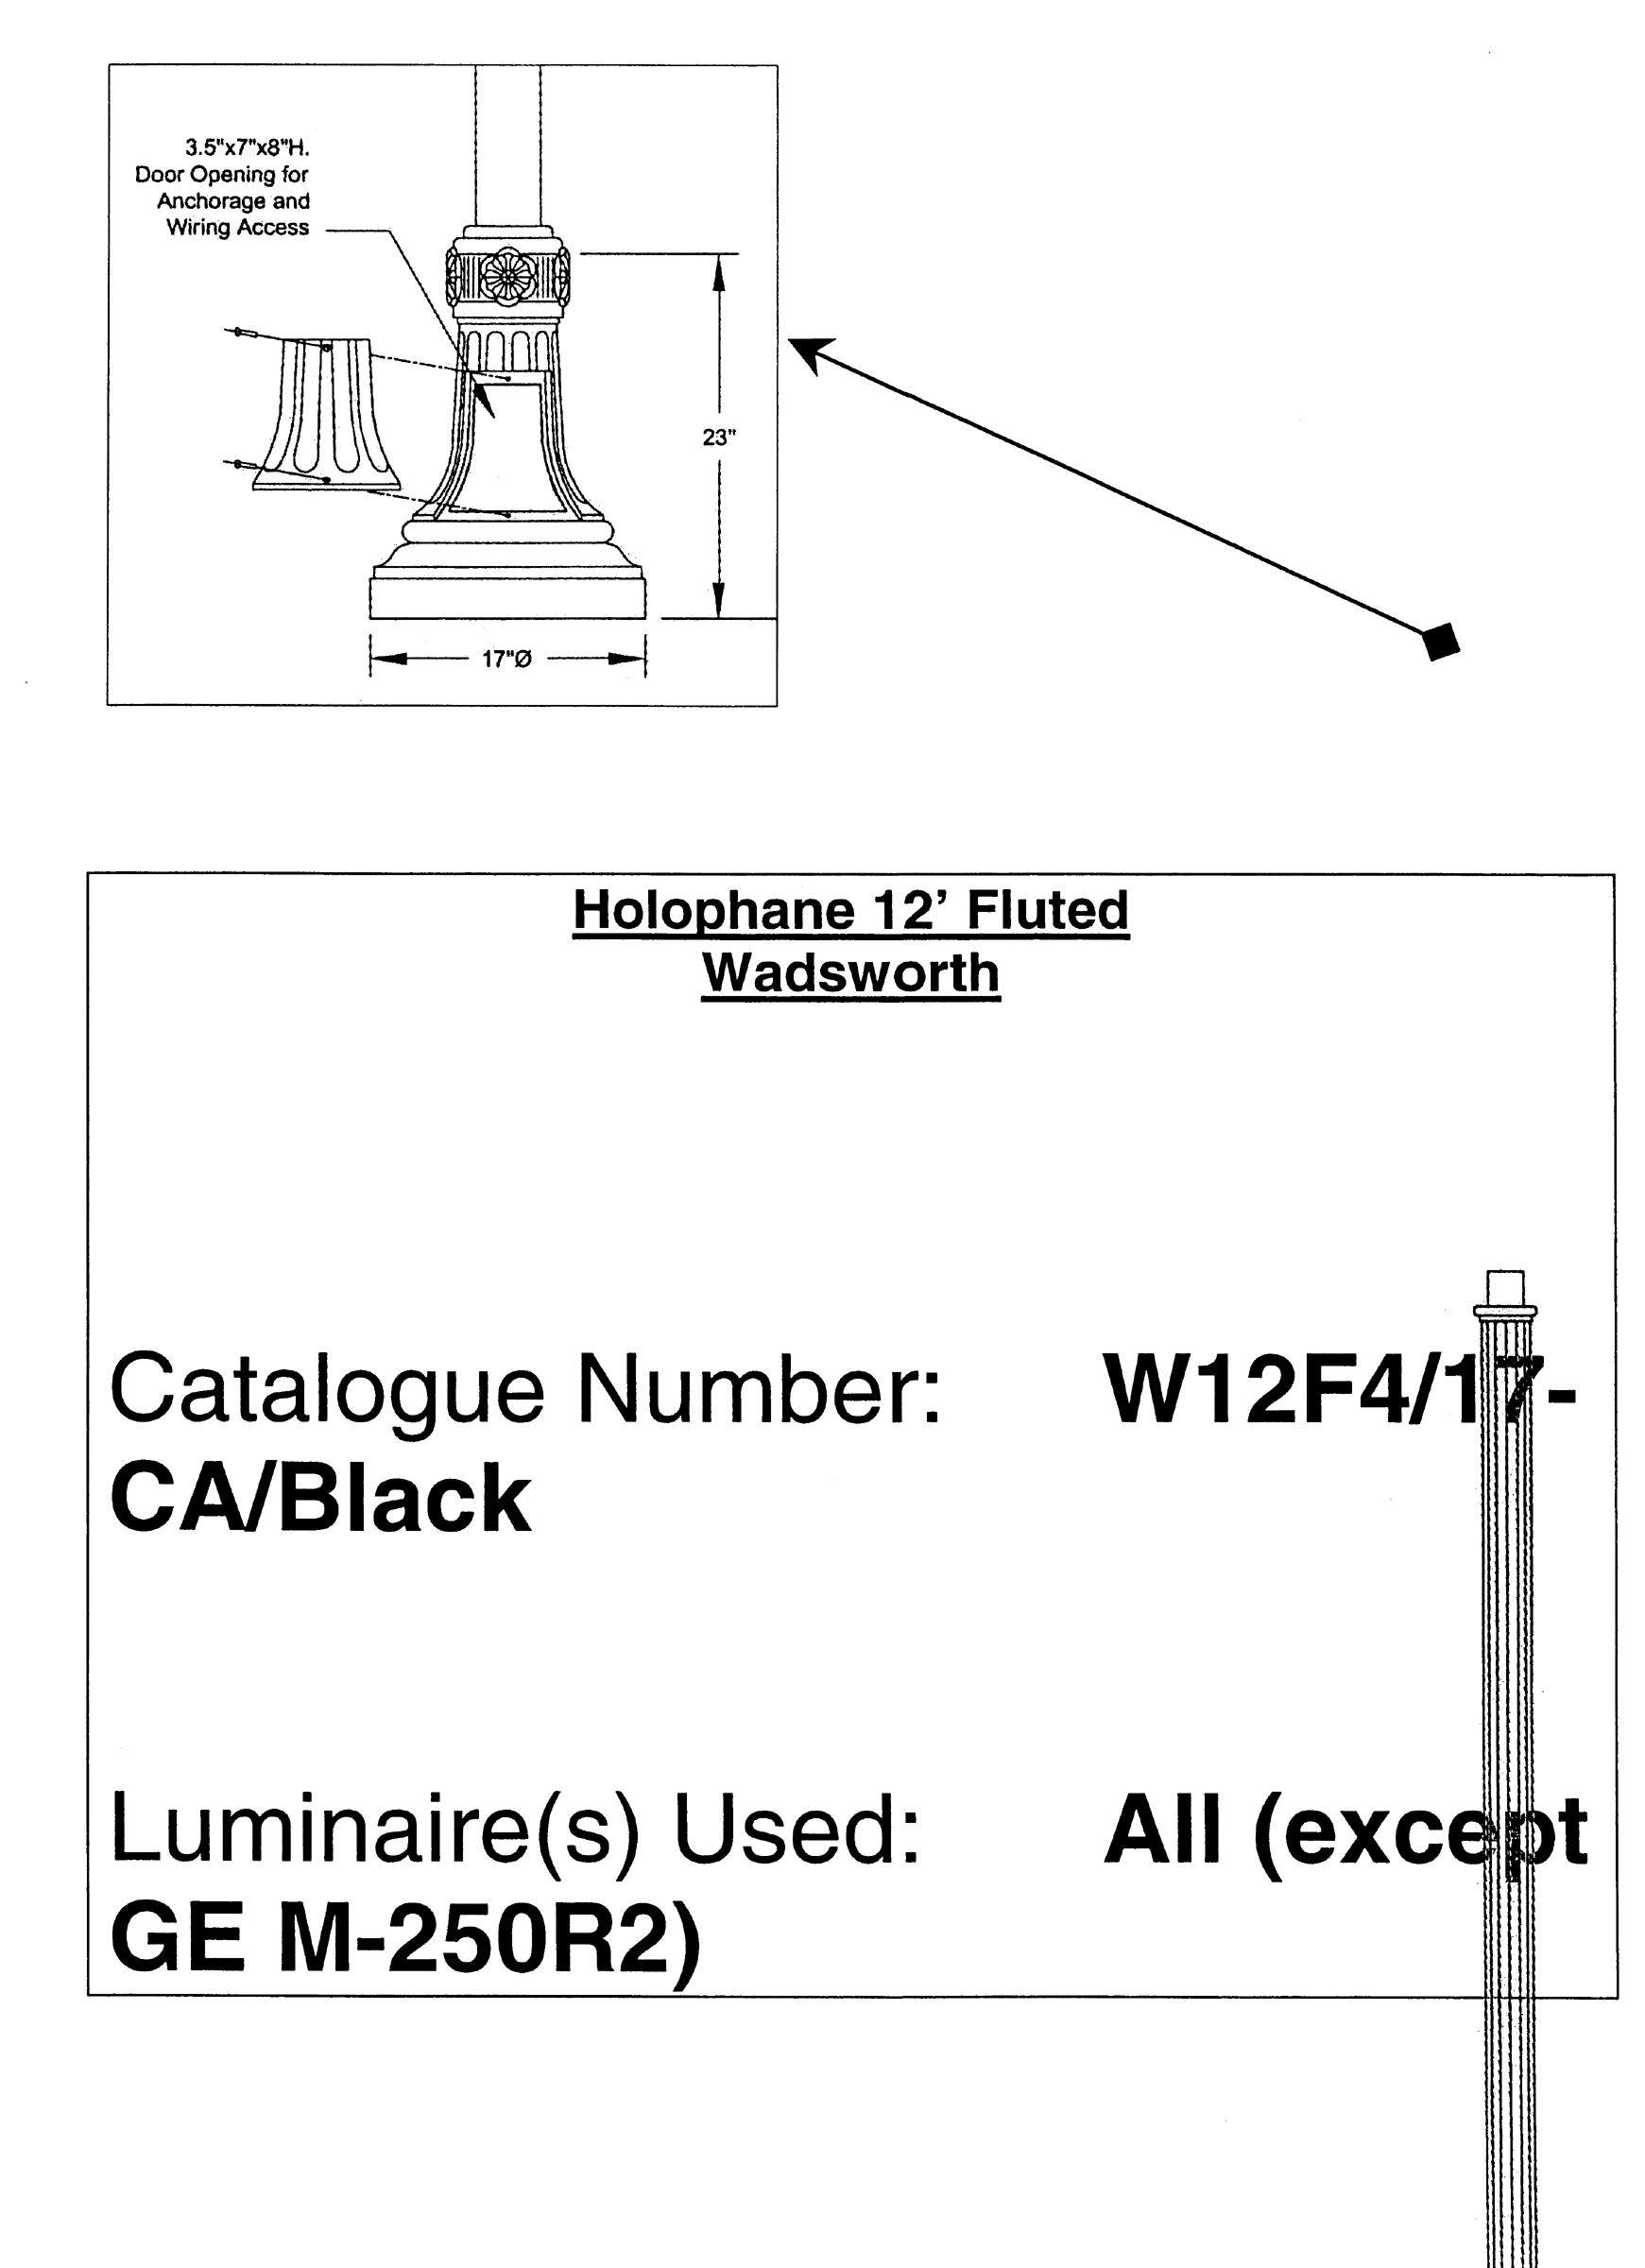 street light wiring diagram street light wire diagram e2 wiring diagram  street light wire diagram e2 wiring